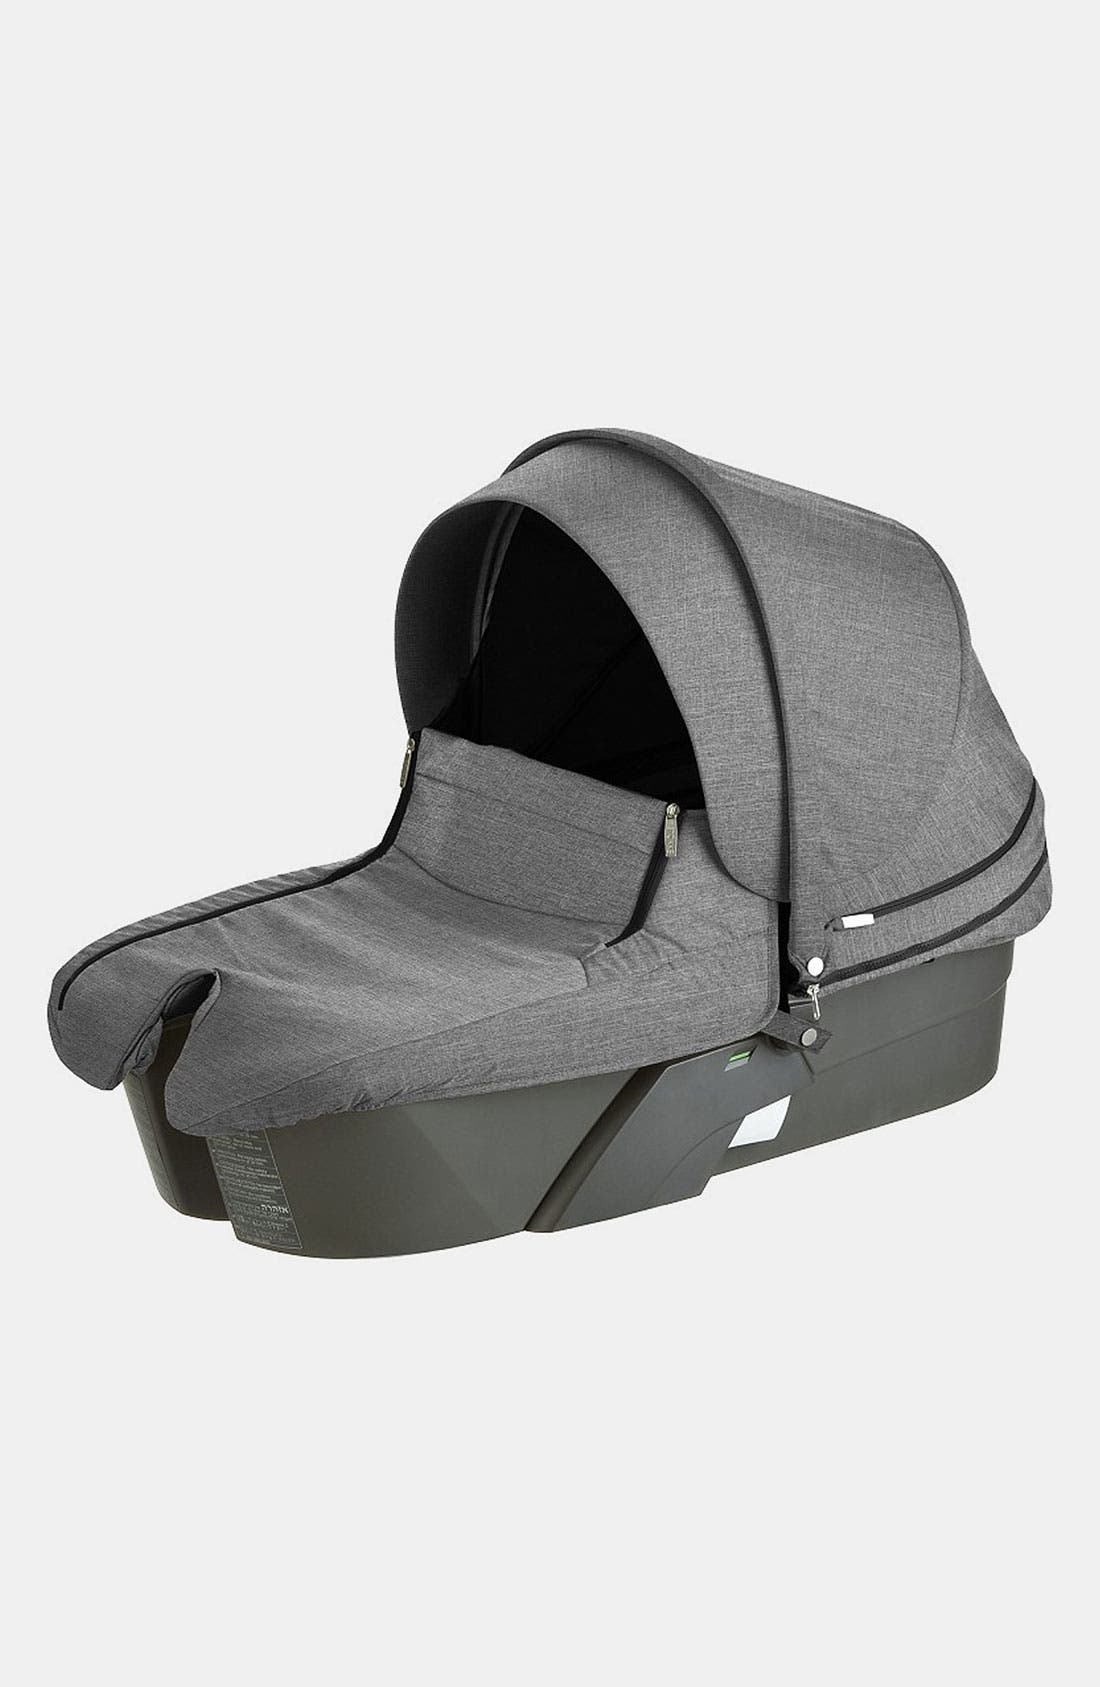 'Xplory<sup>®</sup>' Stroller Carry Cot,                         Main,                         color, 001